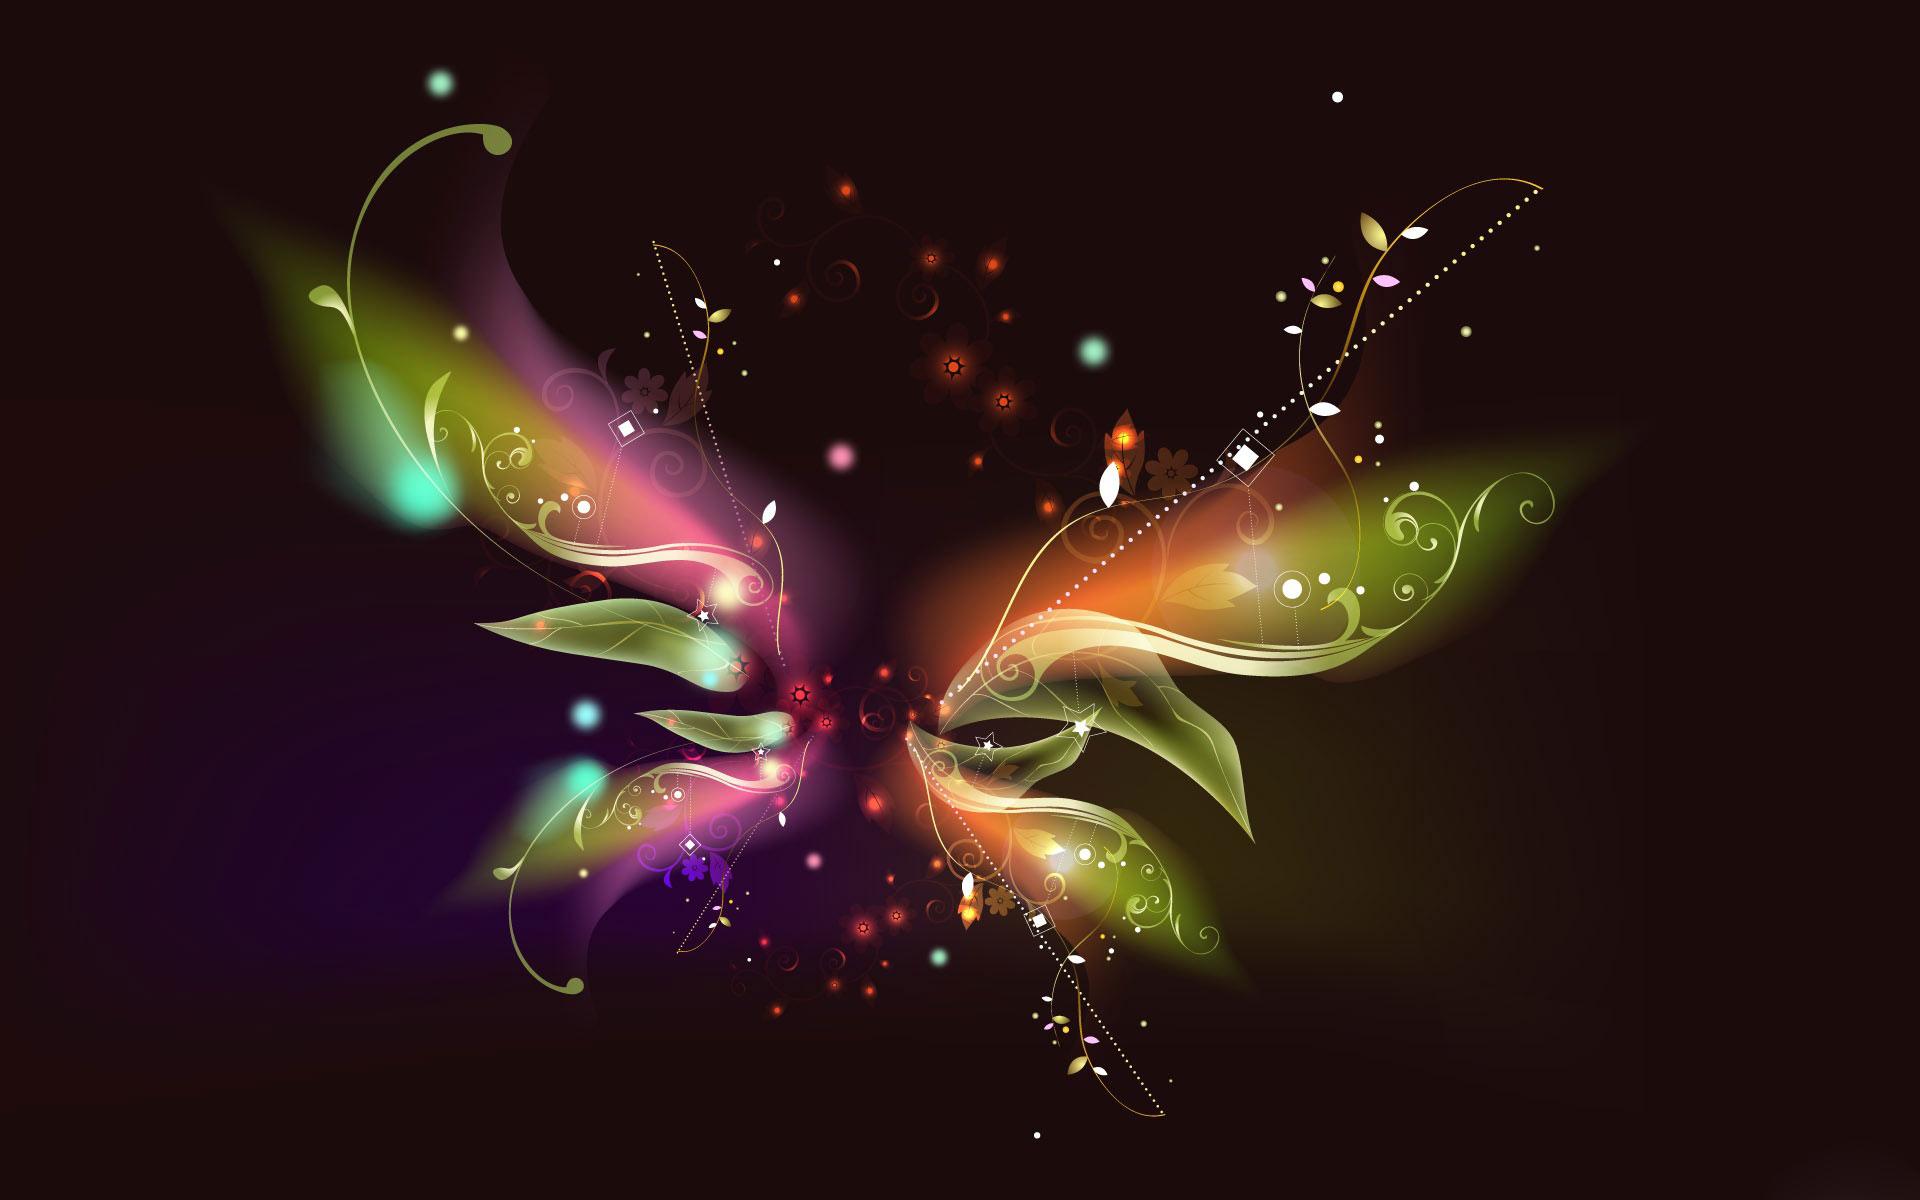 butterflies live wallpaper free download